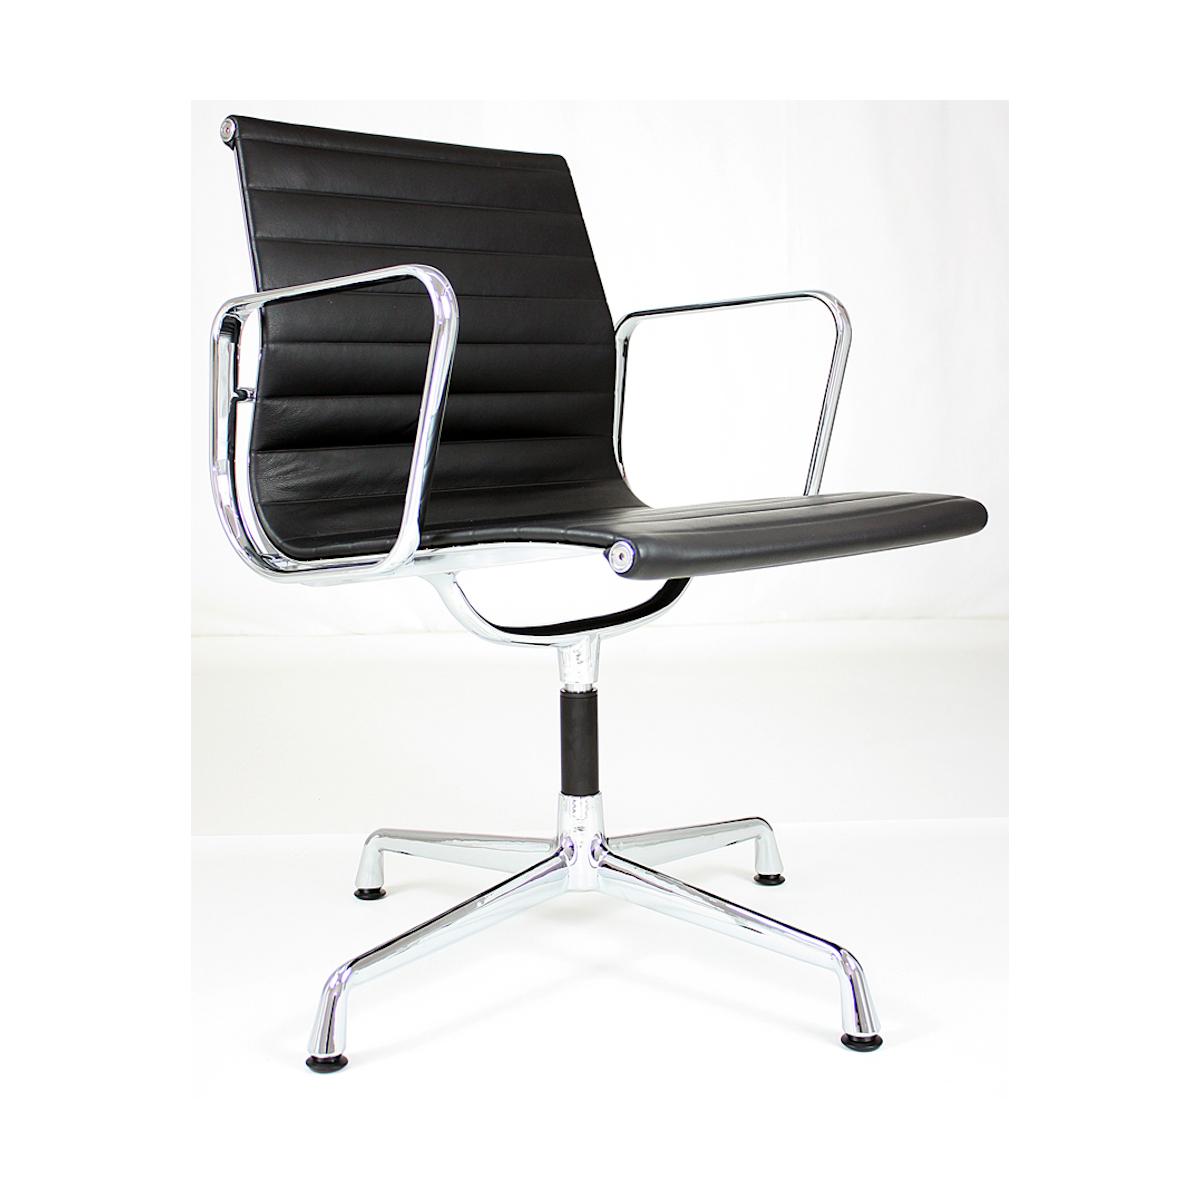 Modern office chair no wheels Elegant Modern Desk Chair Without Wheels Desk Small Desk Chairs Tiltbrawl Ideas Modern House Desk Chairs Without Wheels Visual Hunt